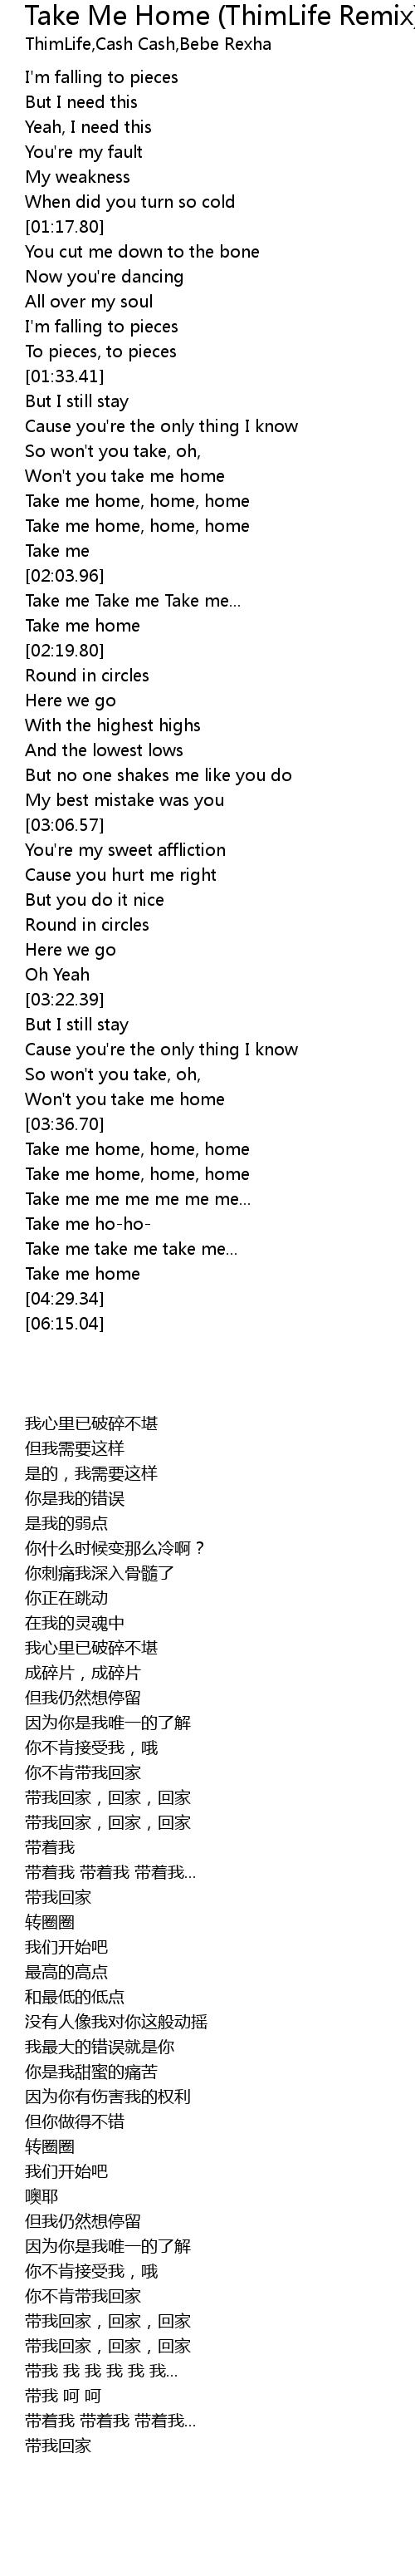 Take Me Home Thimlife Remix Lyrics Follow Lyrics